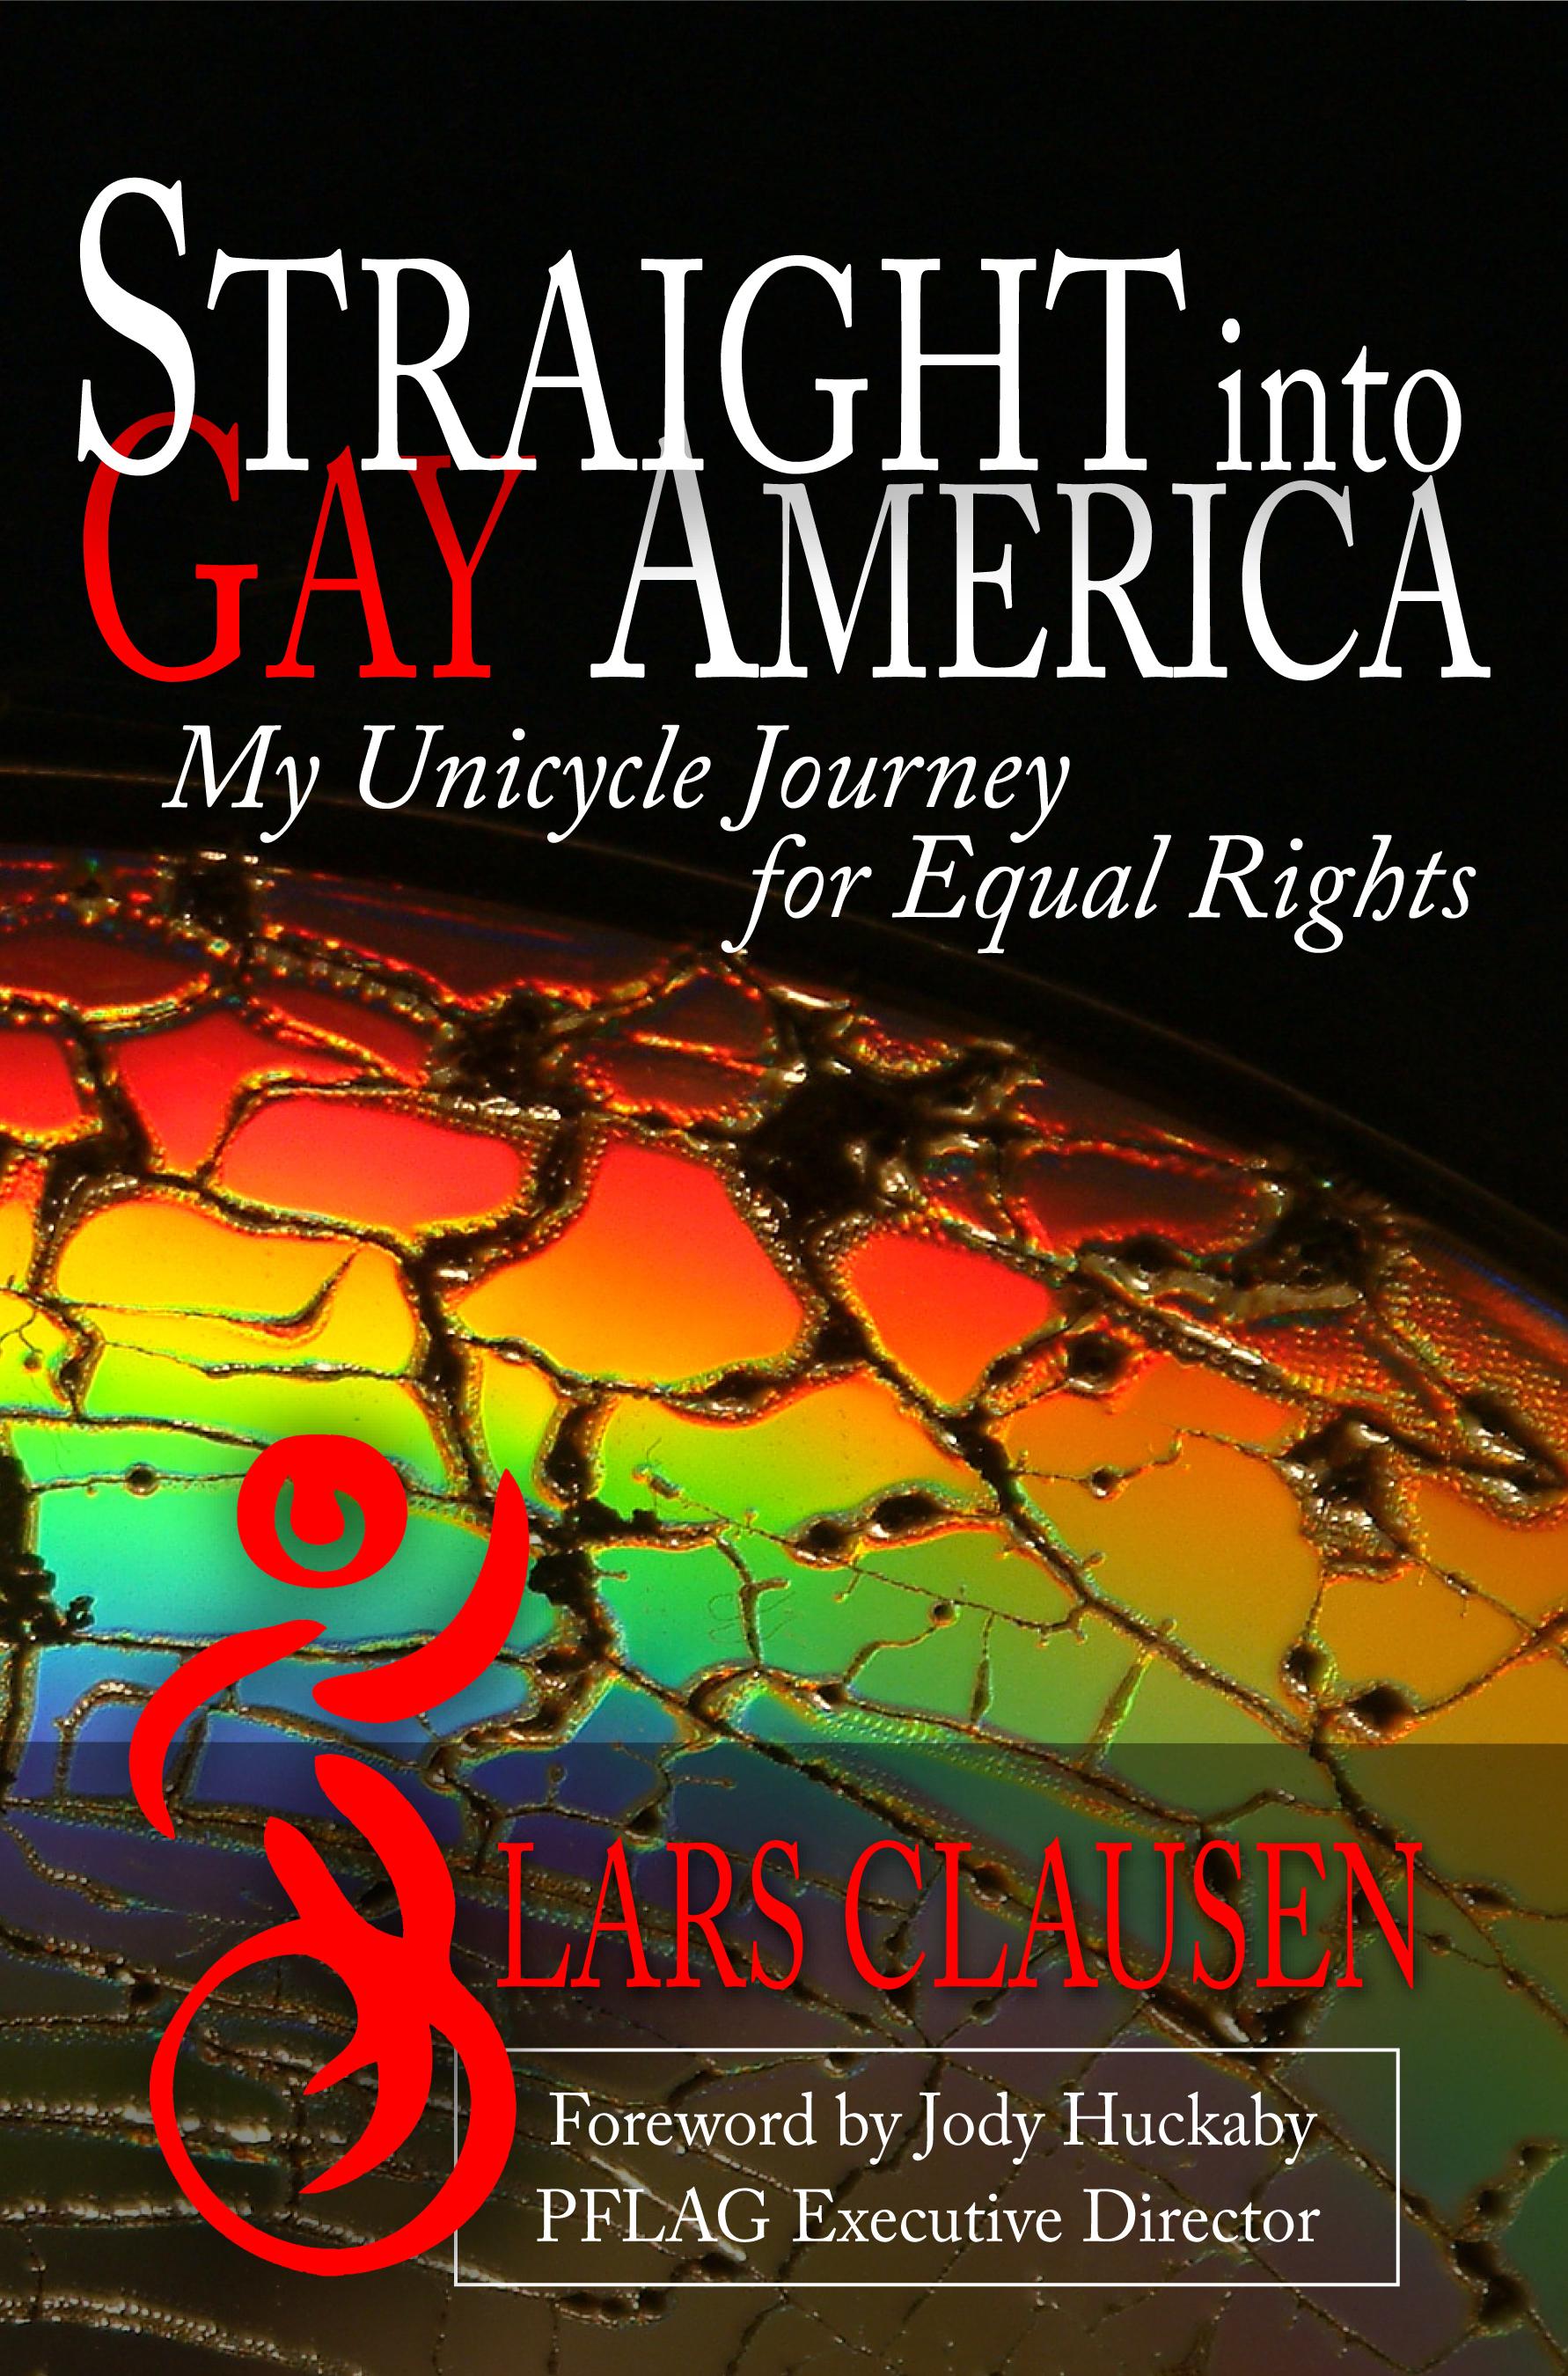 Gay author awards